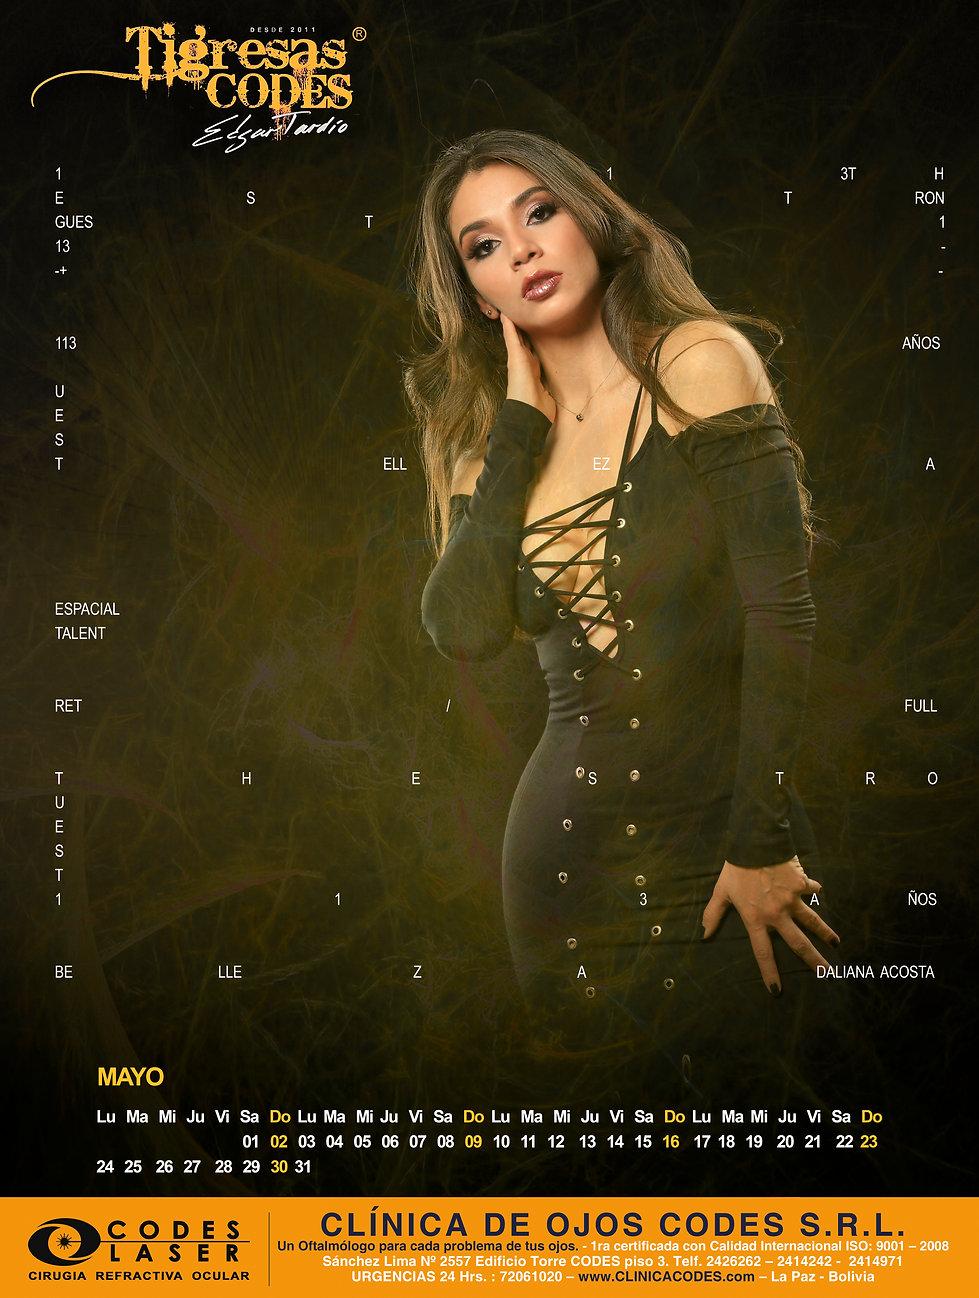 3 calendario 2021-22 MAYO DALIANA.jpg